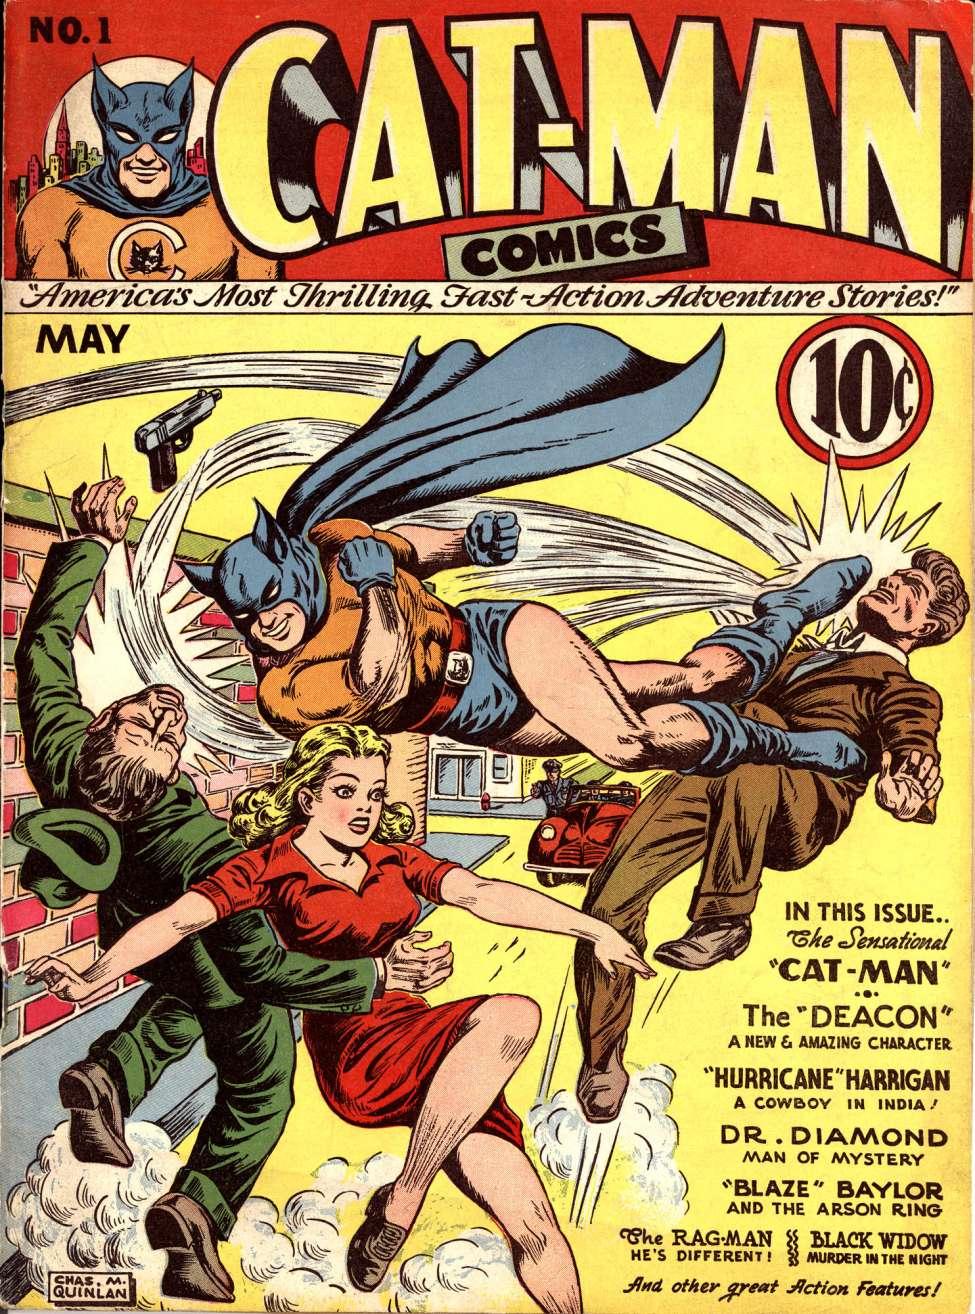 Cat Man #1 by Helnit Publishing Co.